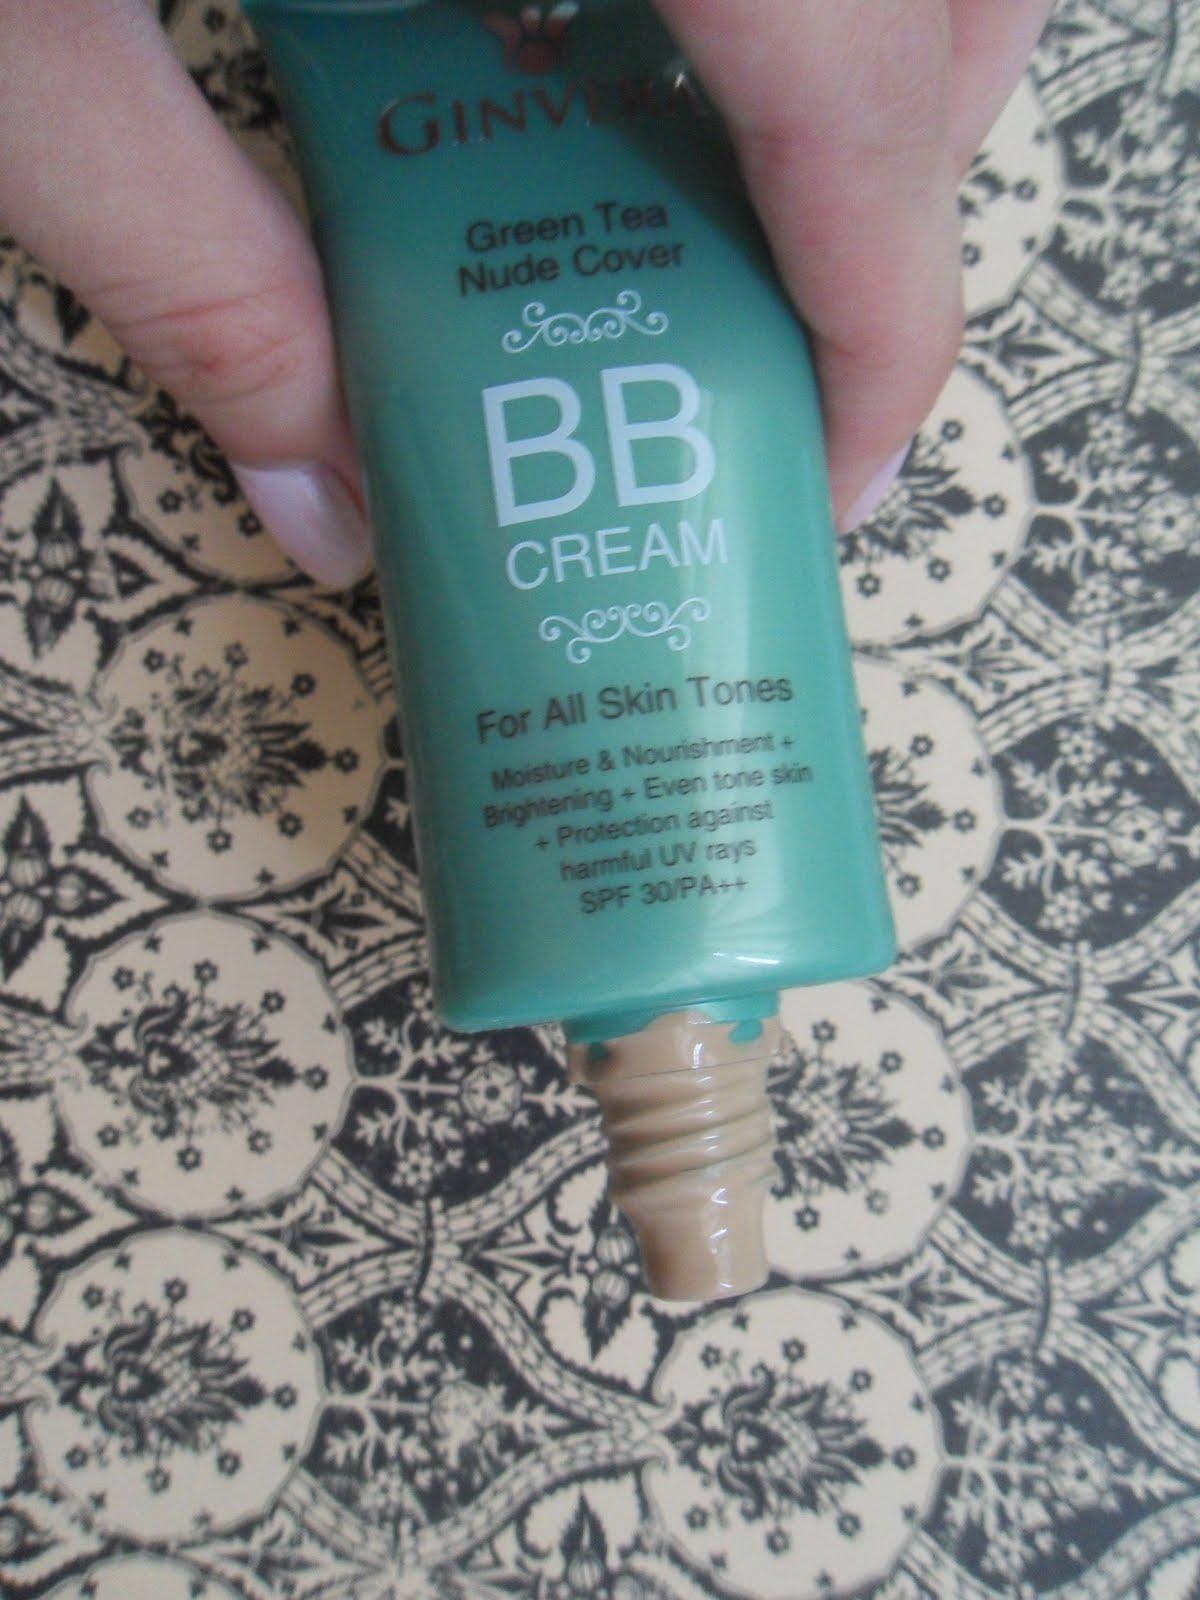 Floral Republic: Review: Ginvera Green Tea BB Cream